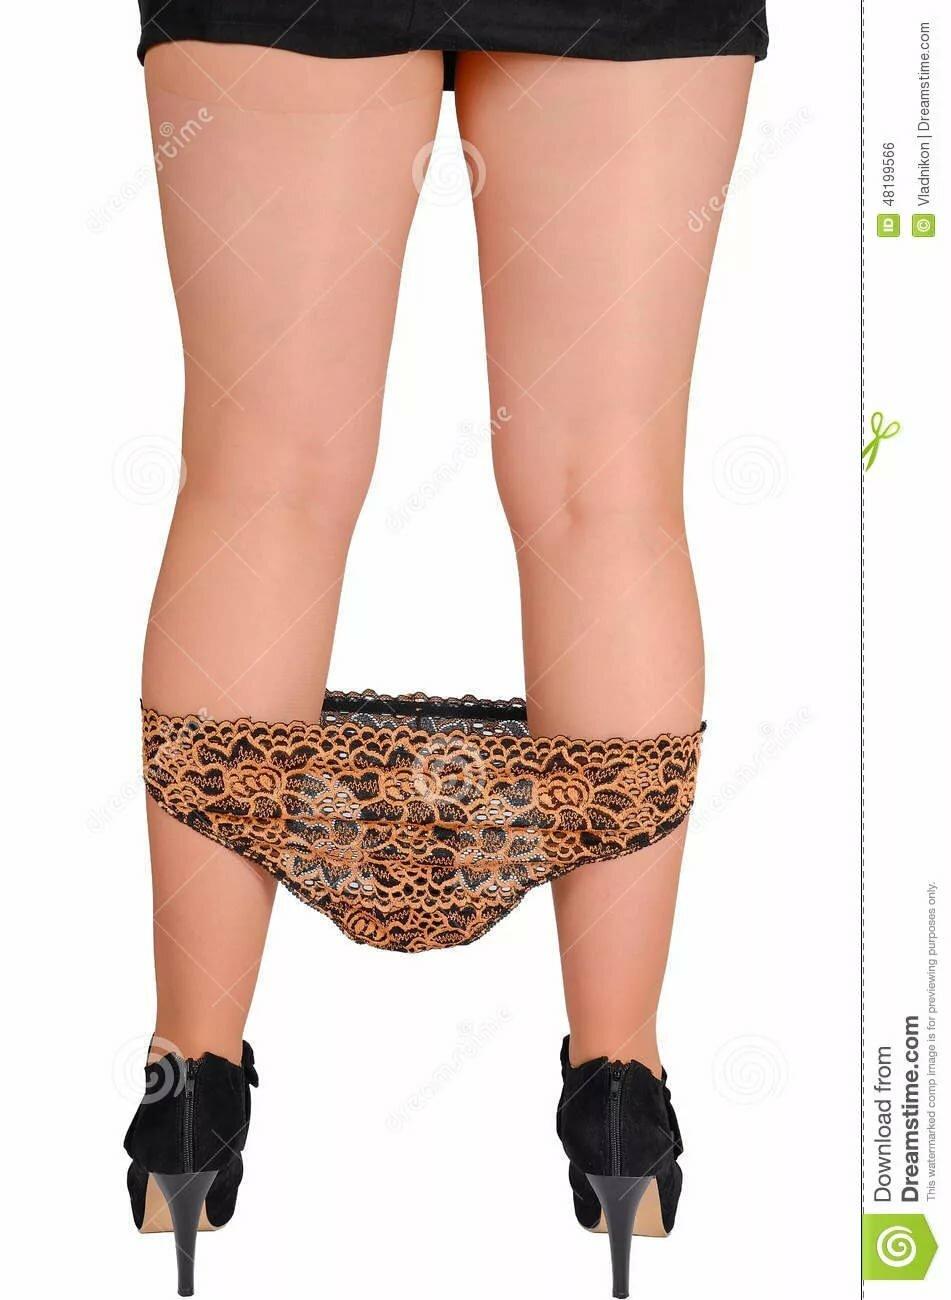 девушка приспустила трусики в юбке